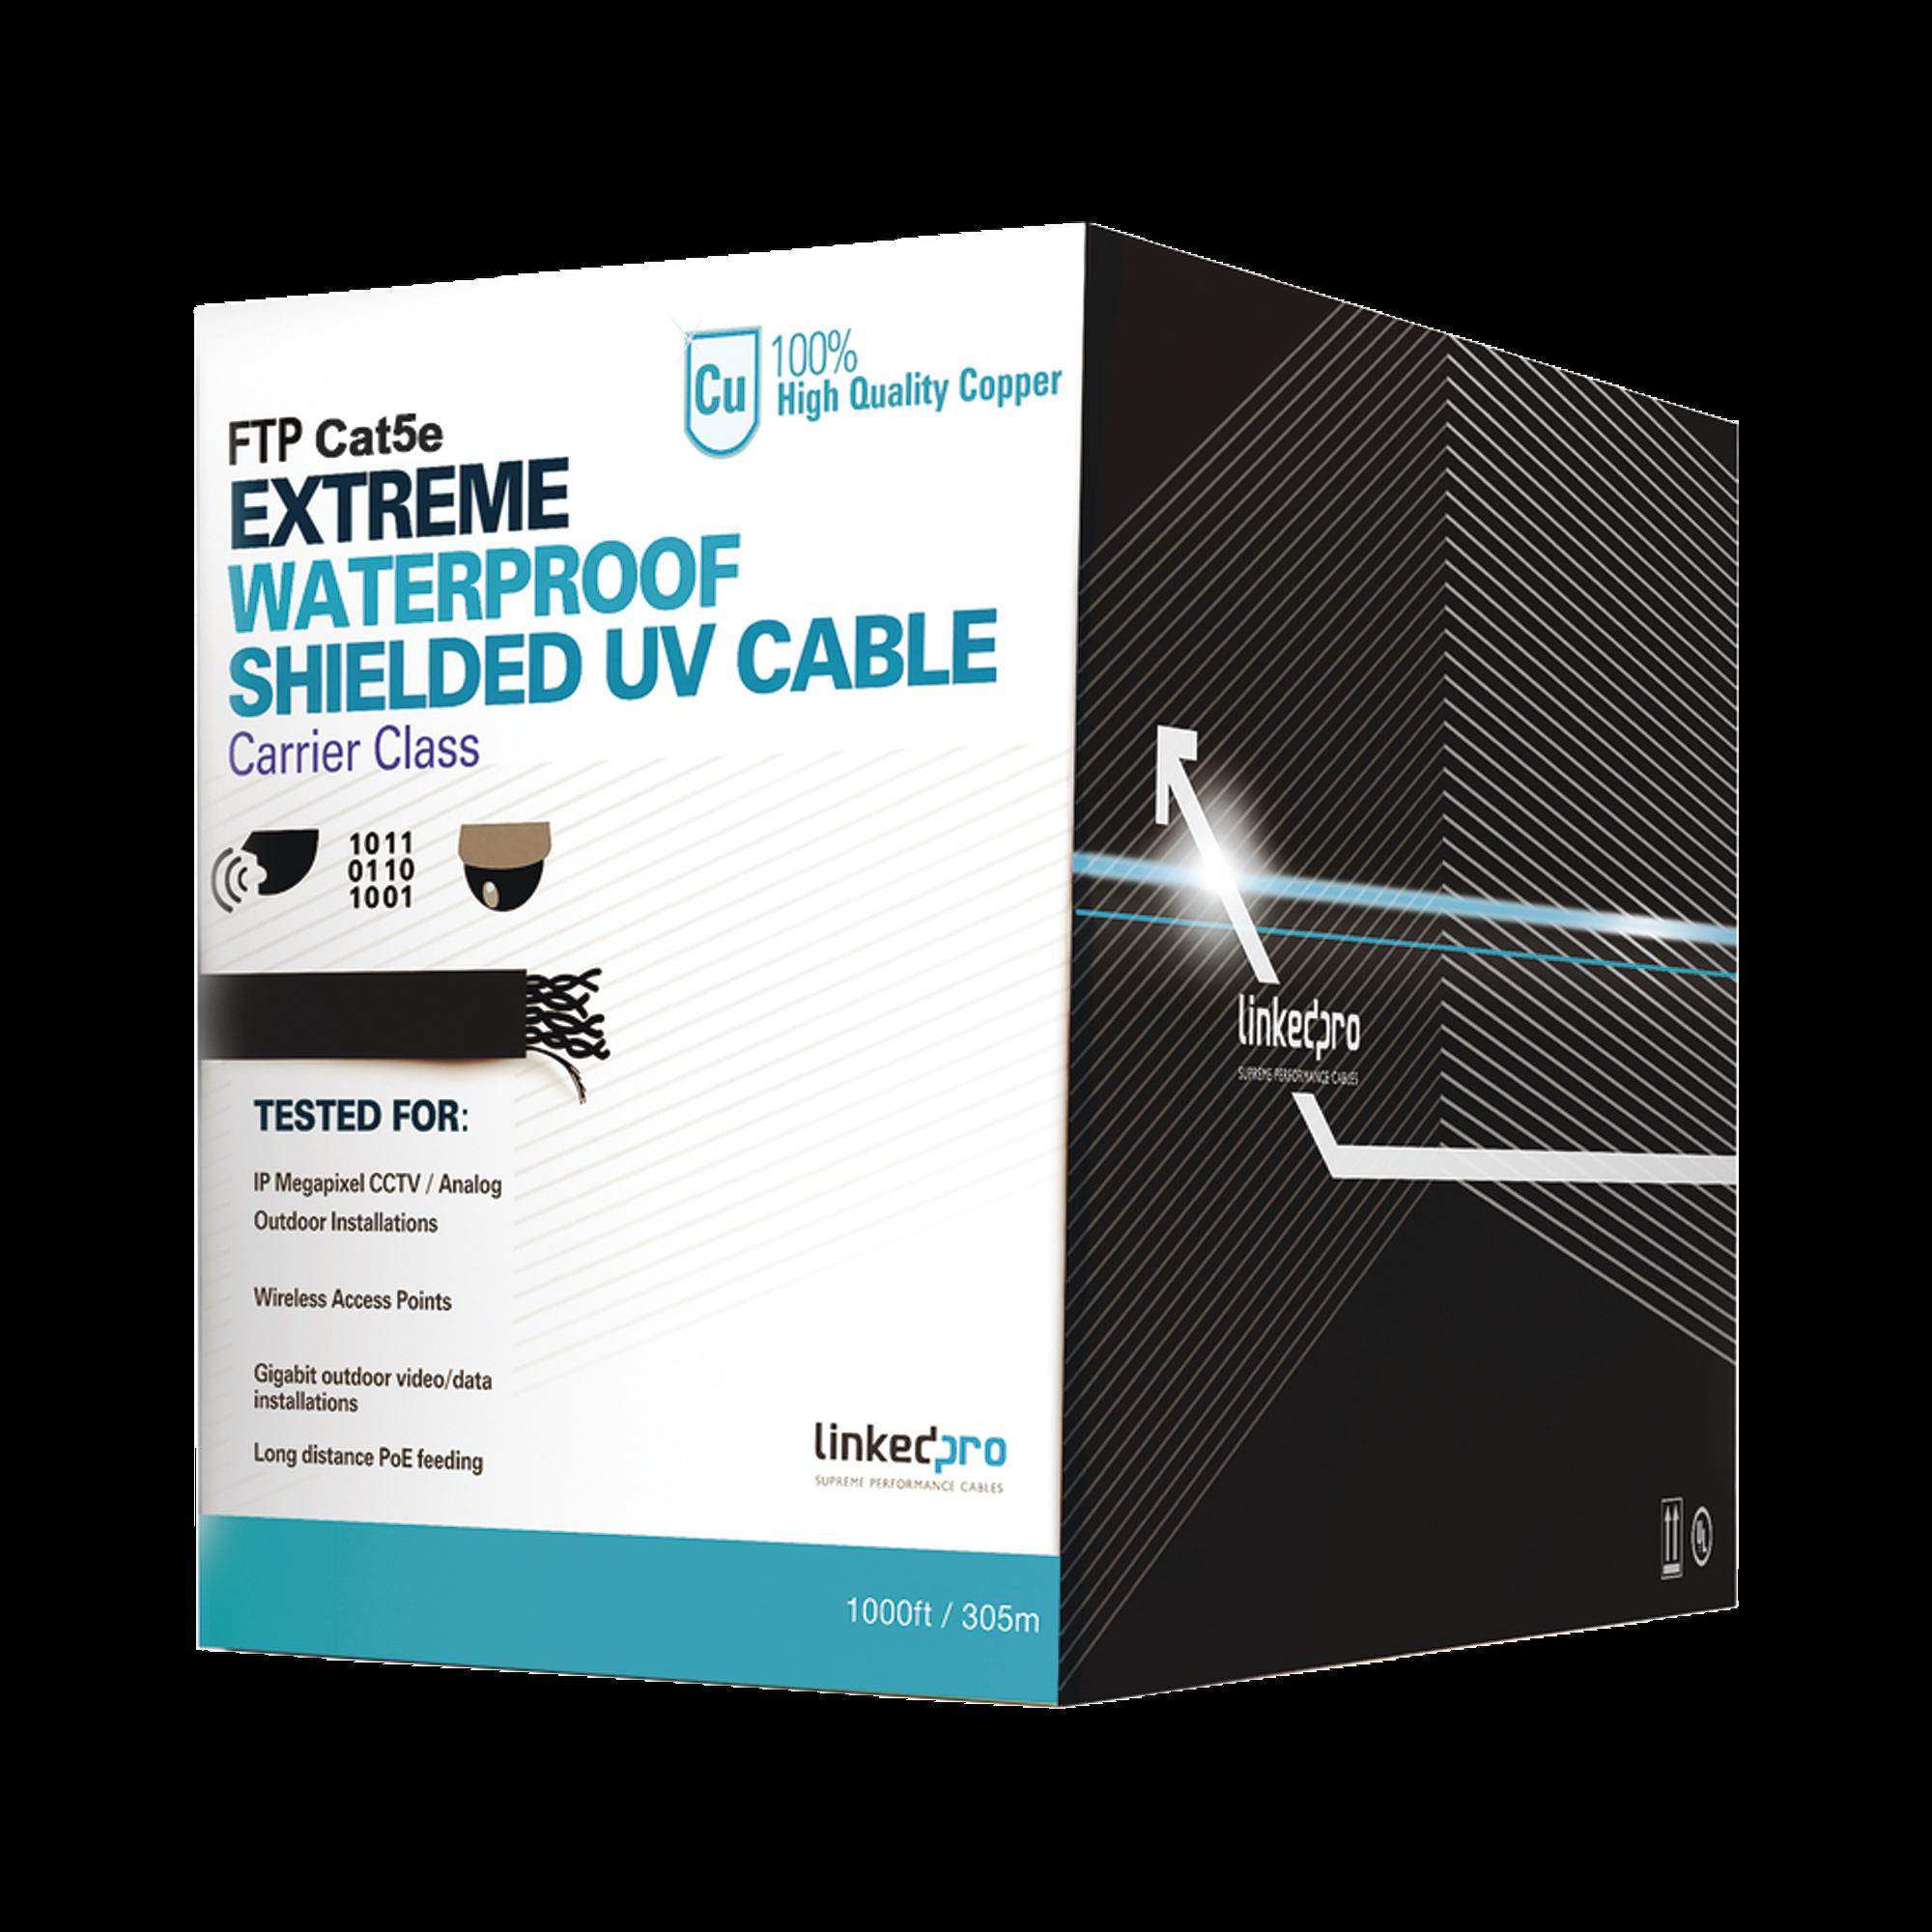 Bobina de cable de 305 m, Cat5e, color negro, sin blindar,  para aplicaciones de CCTV, redes de datos. Uso en intemperie